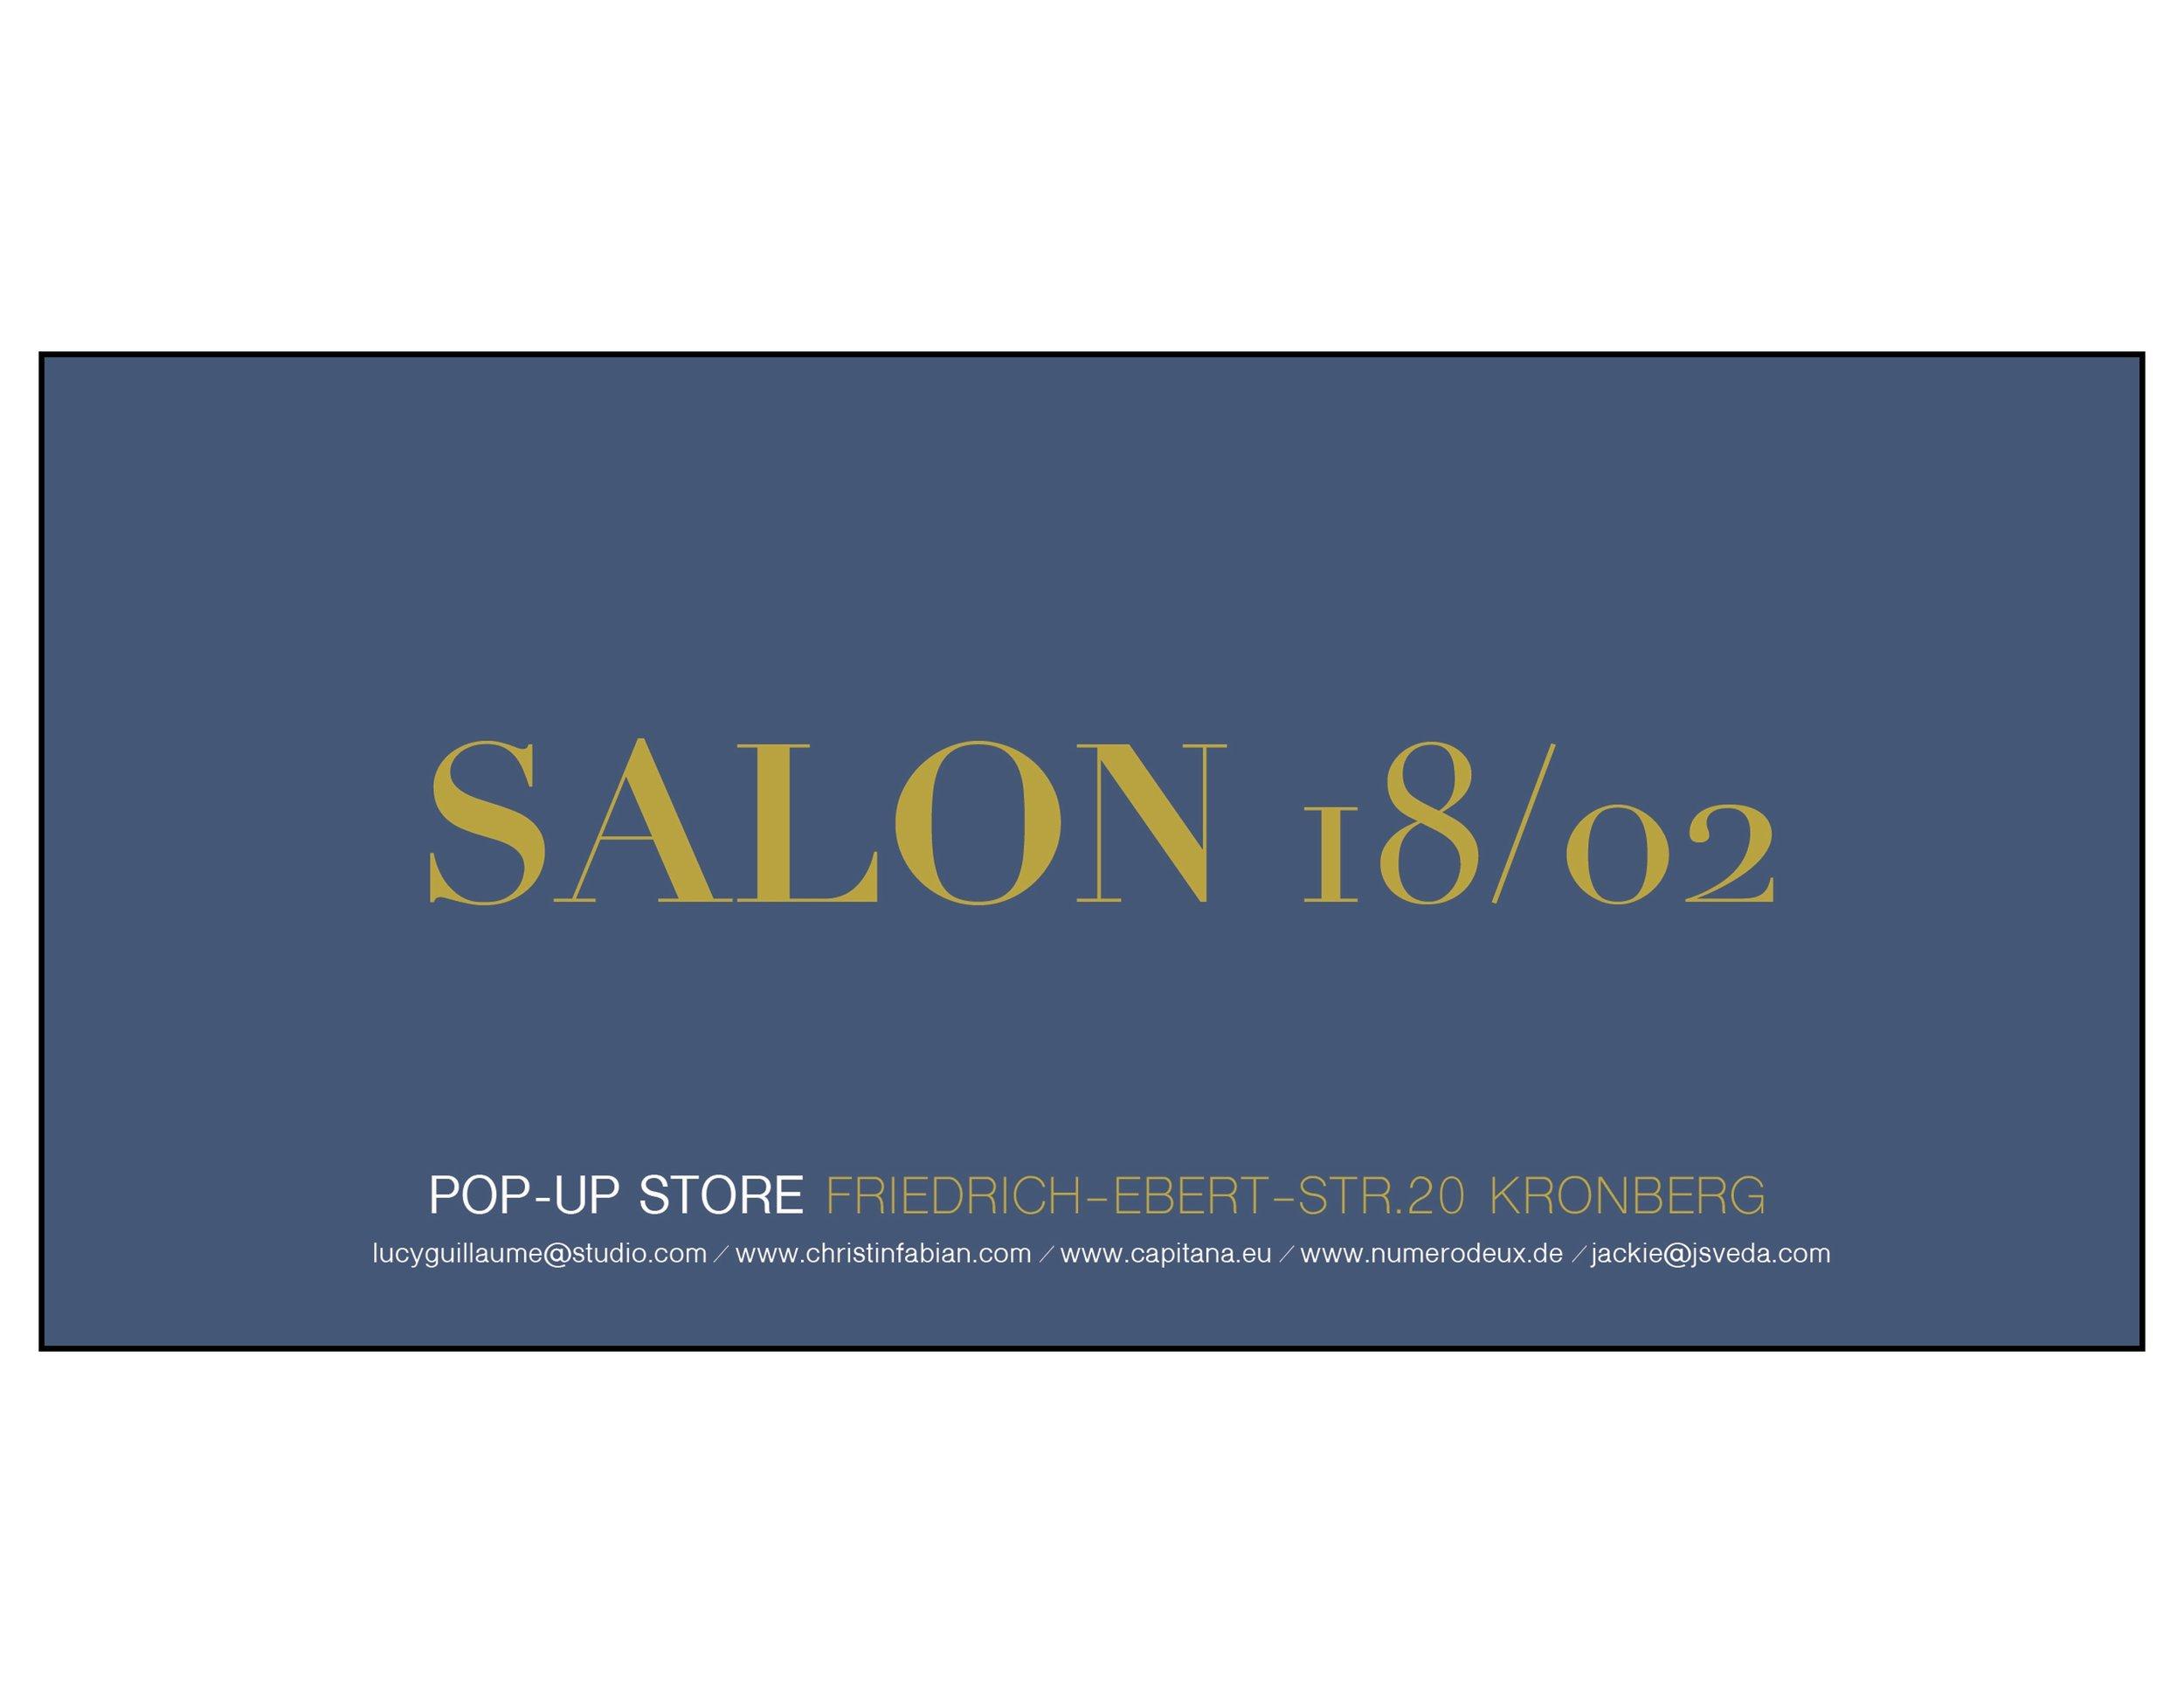 Salon.flyeralarmprint.jpg